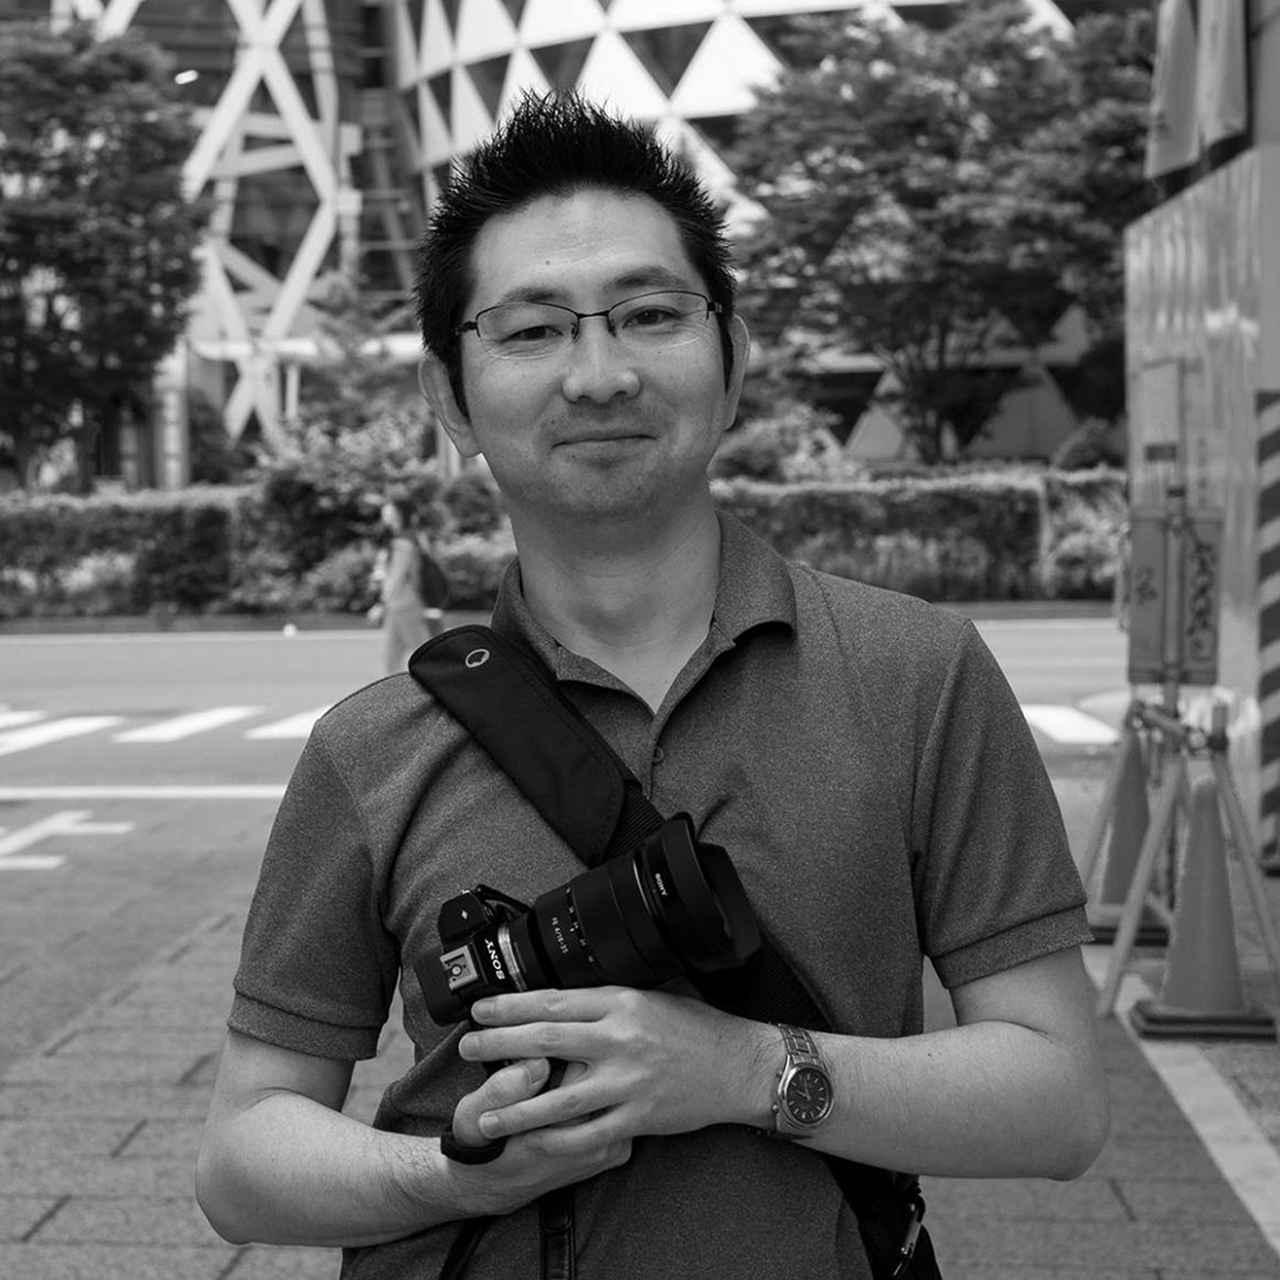 Images : 13番目の画像 - カメラマン2021カレンダー、荒幡信行「赤外線の情景」 - Webカメラマン